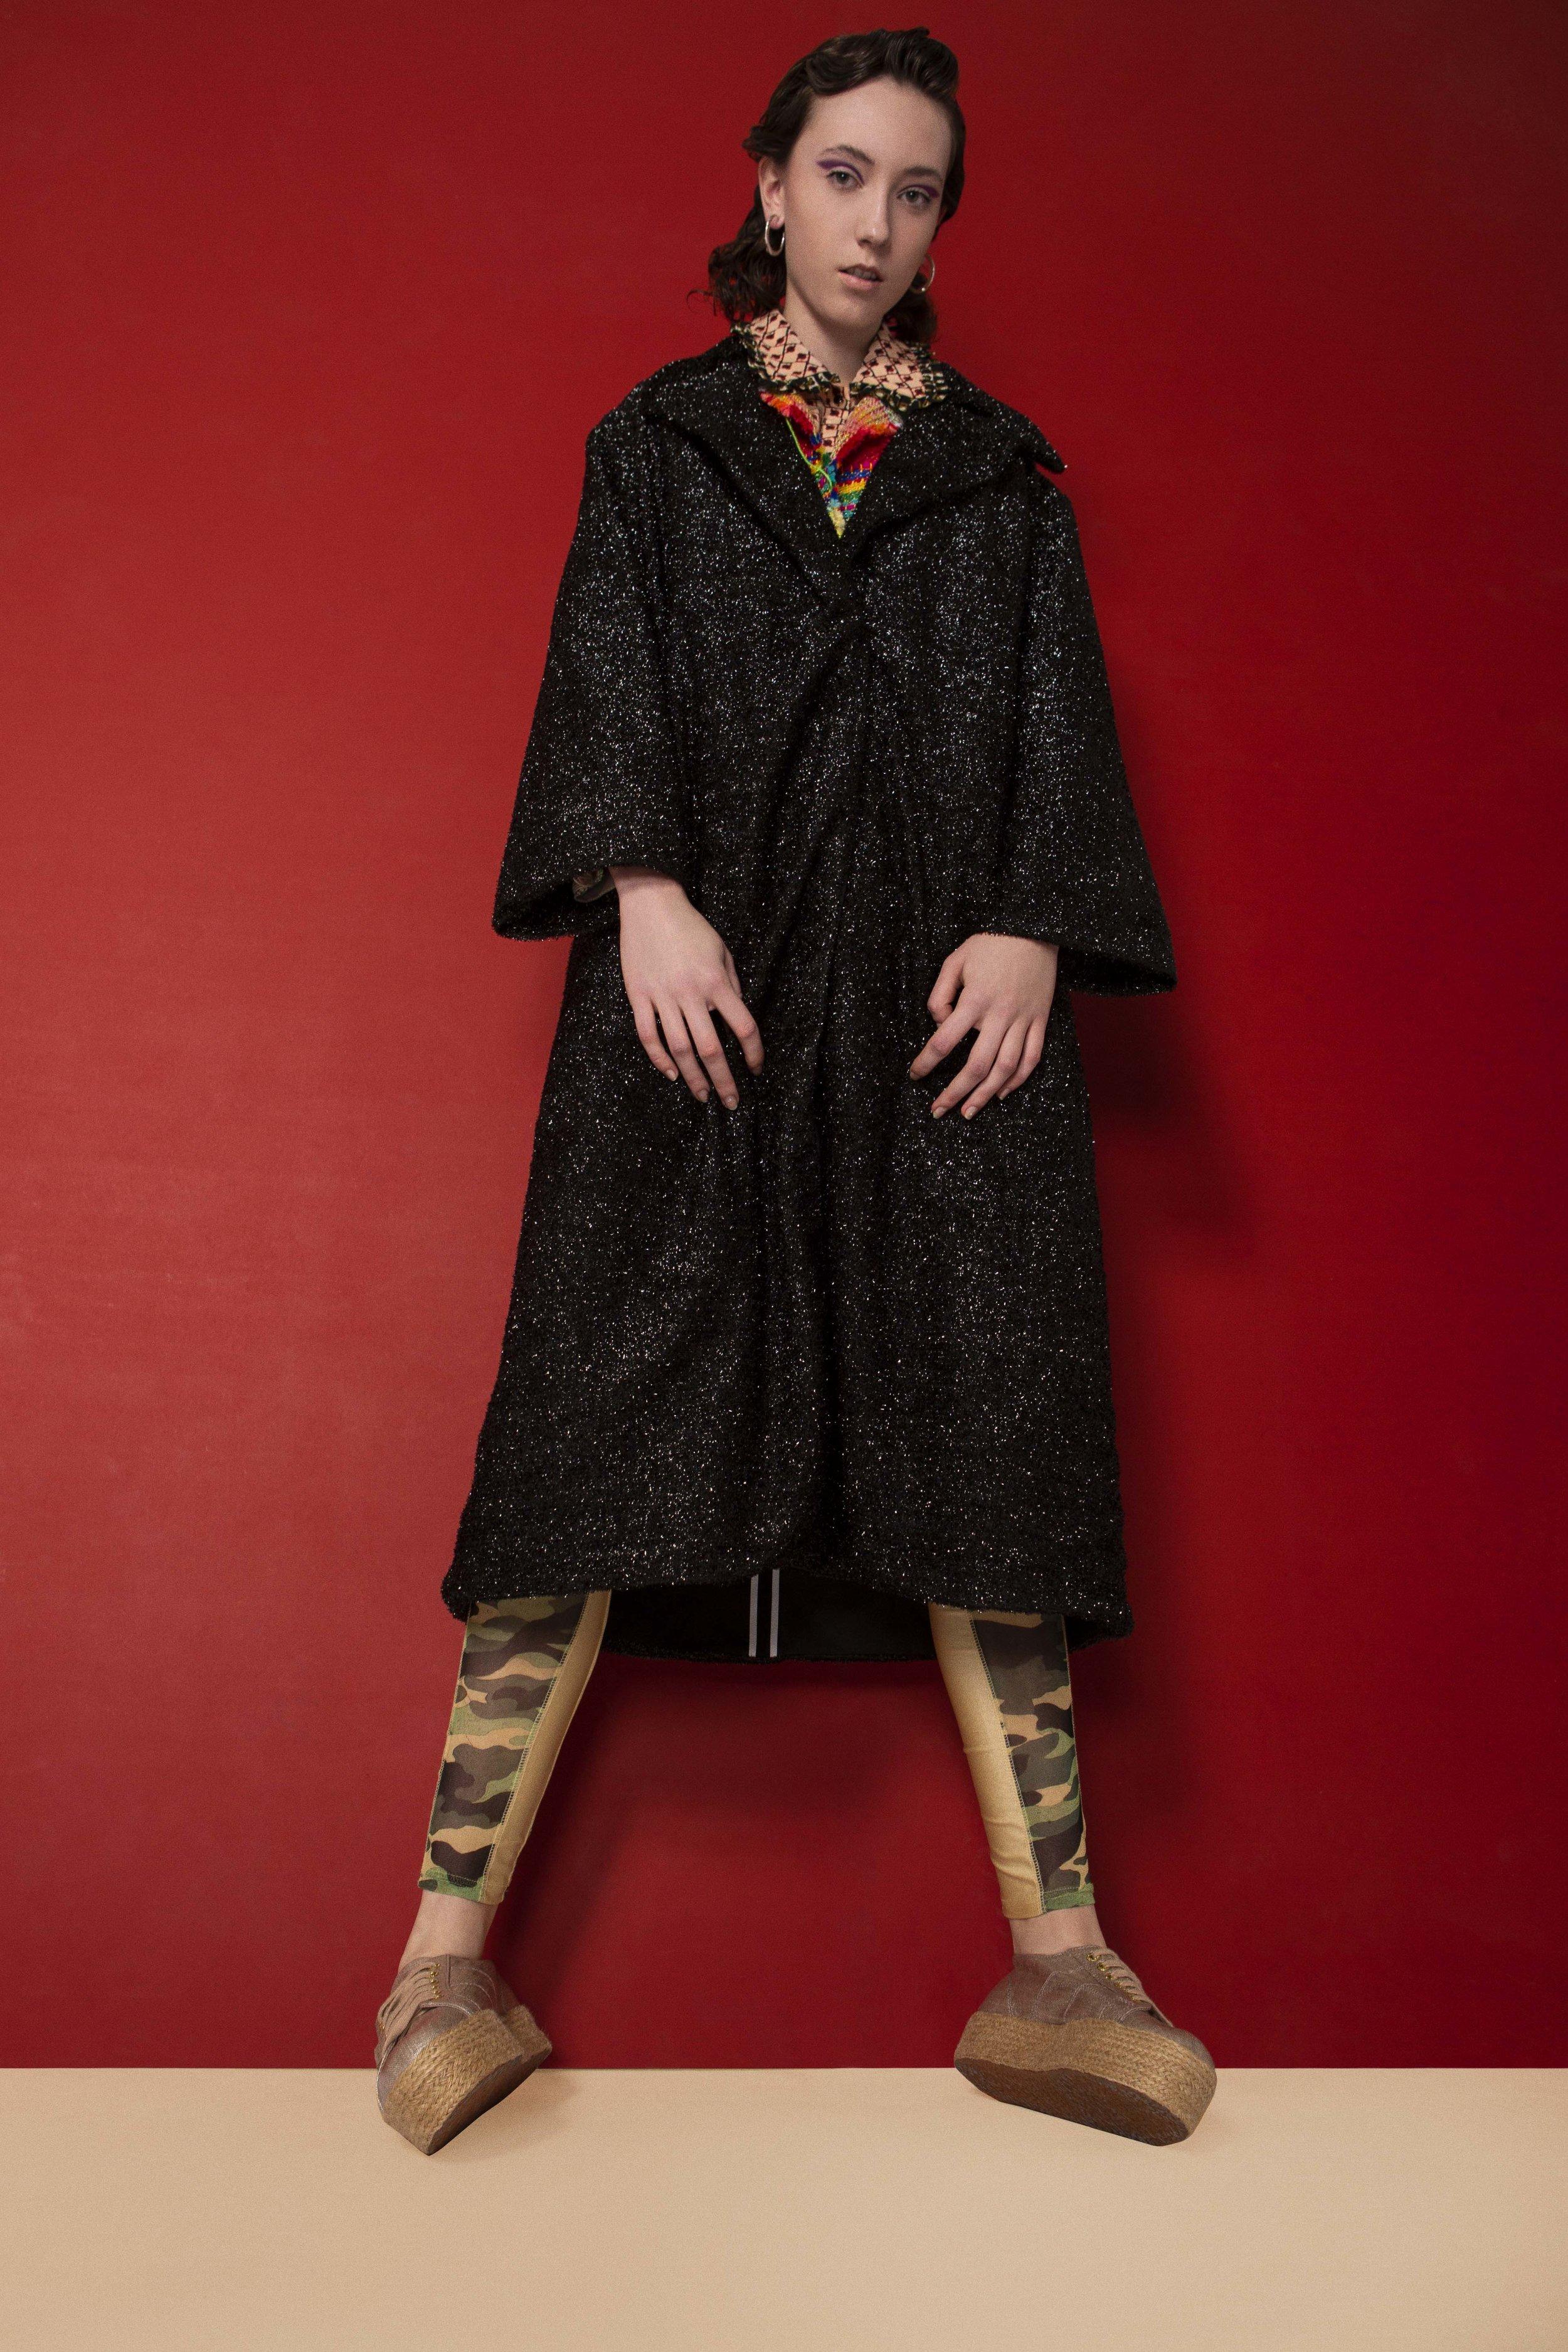 Shirt – ORLA KIELY Jacket – BOO PALA Coat – LONGSHAW WARD Pant – DANS LA VIE Earring – VAN PETERSON Footwear - SUPERGA